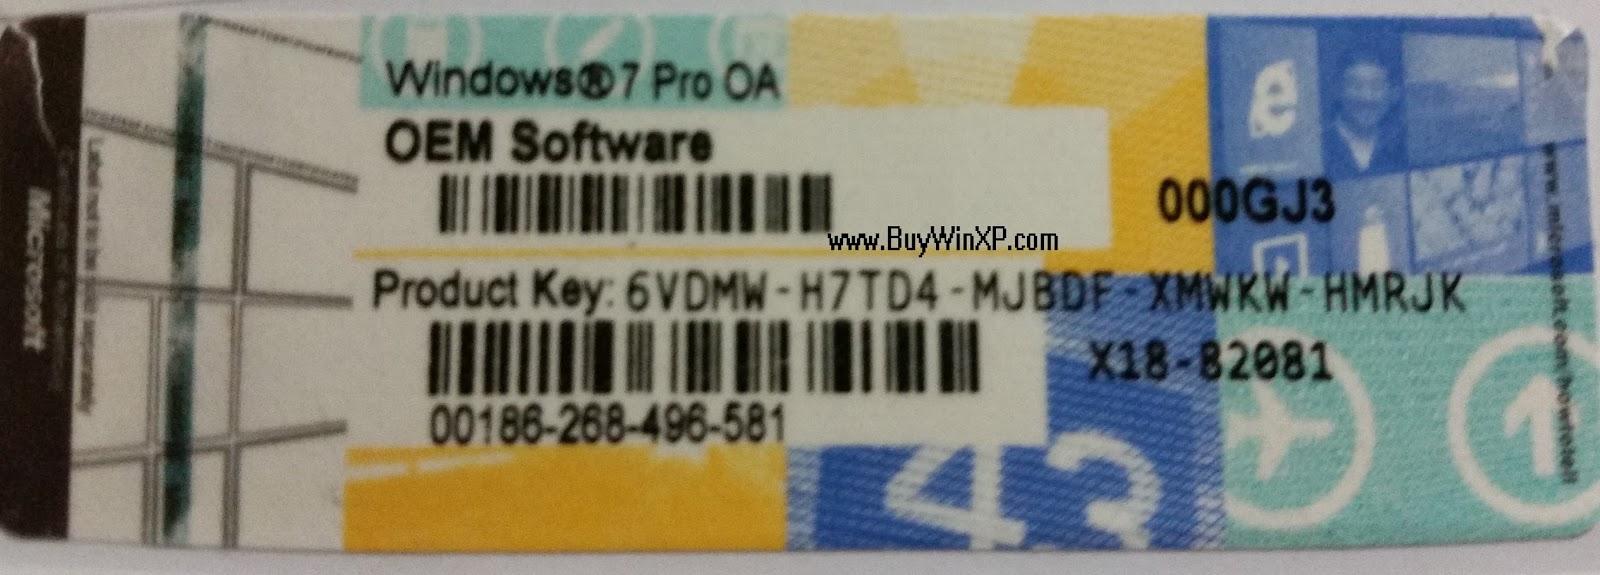 windows 7 pro keys free